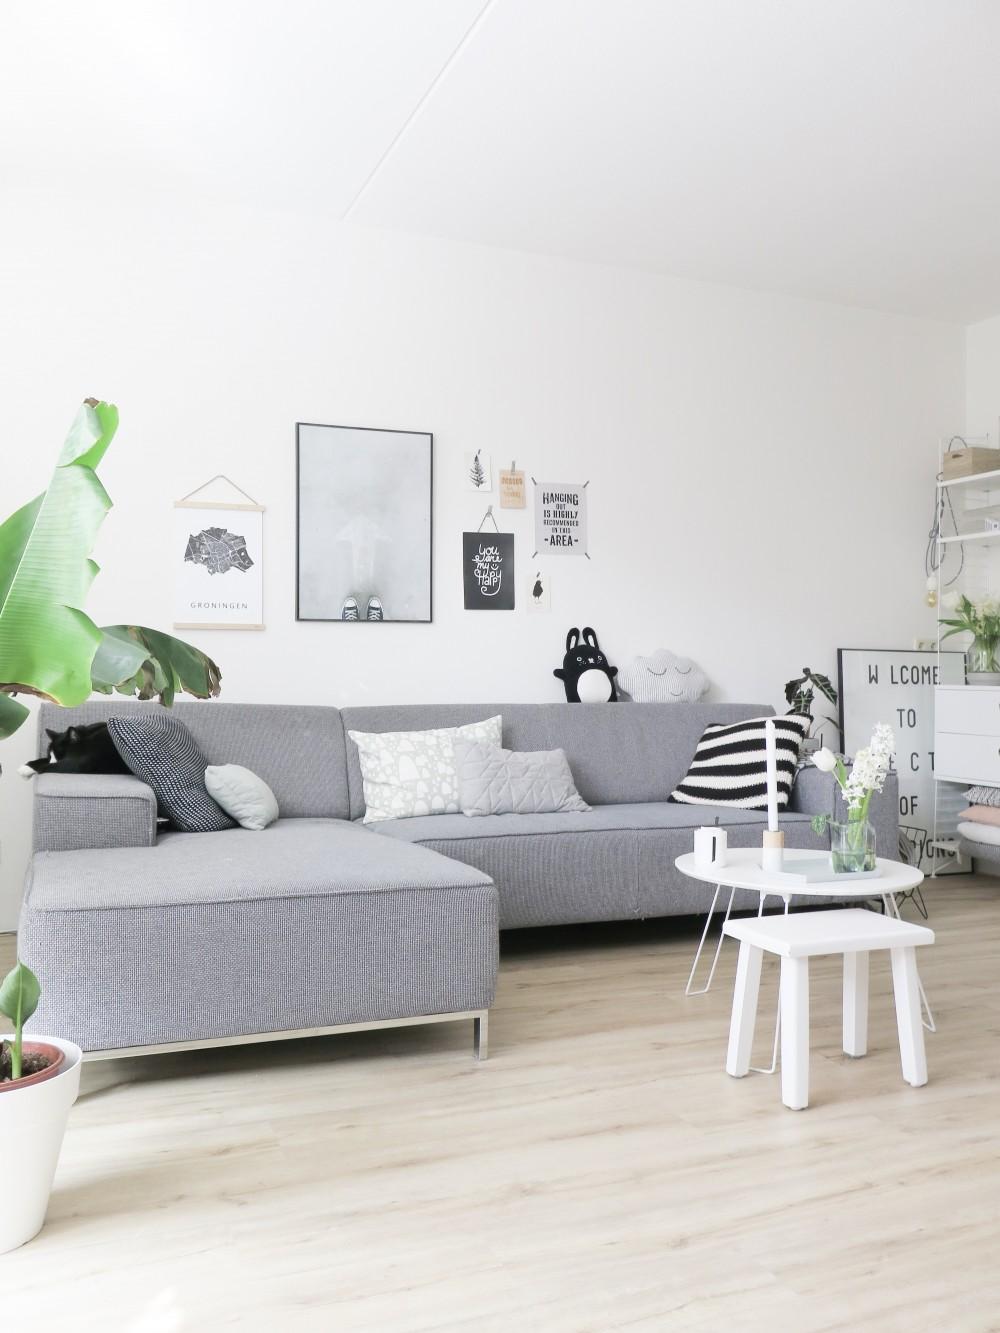 Stadskaart Groningen in woonkamer